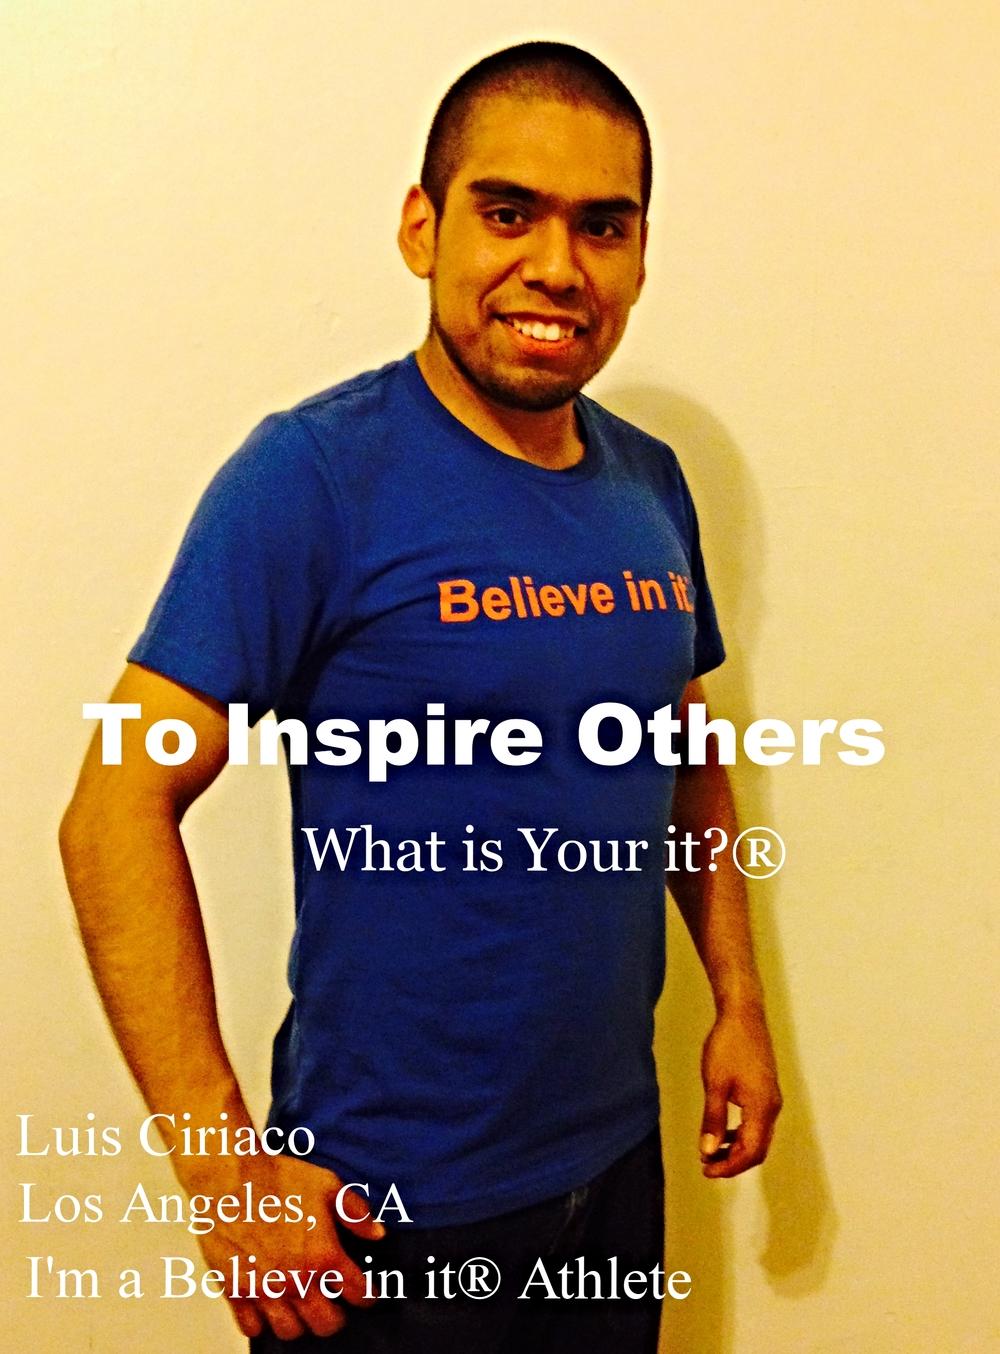 Luis Ciriaco Believe in it Athlete .jpeg